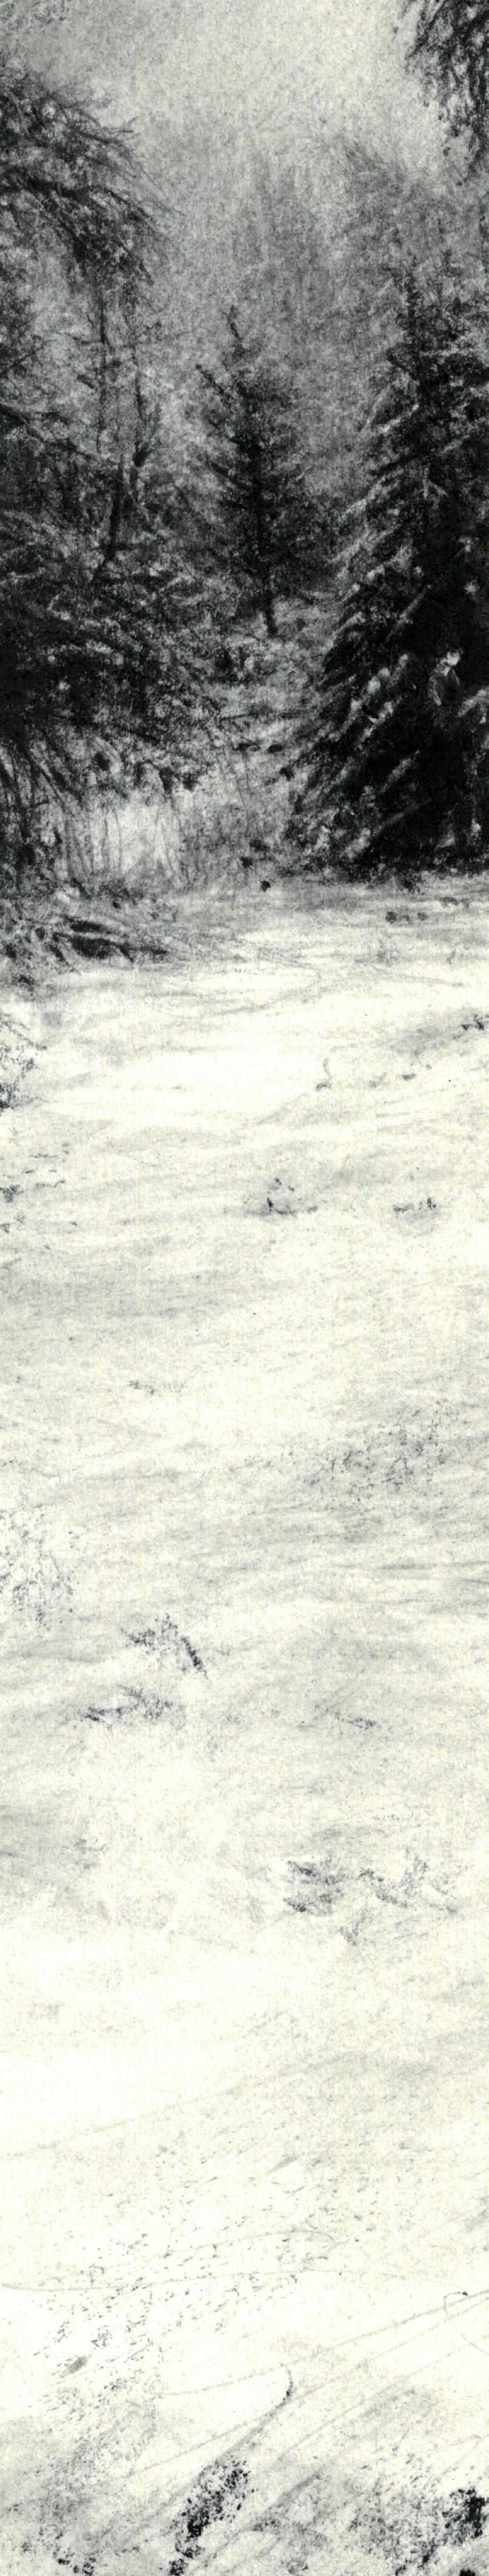 Birnam Trees in the Snow